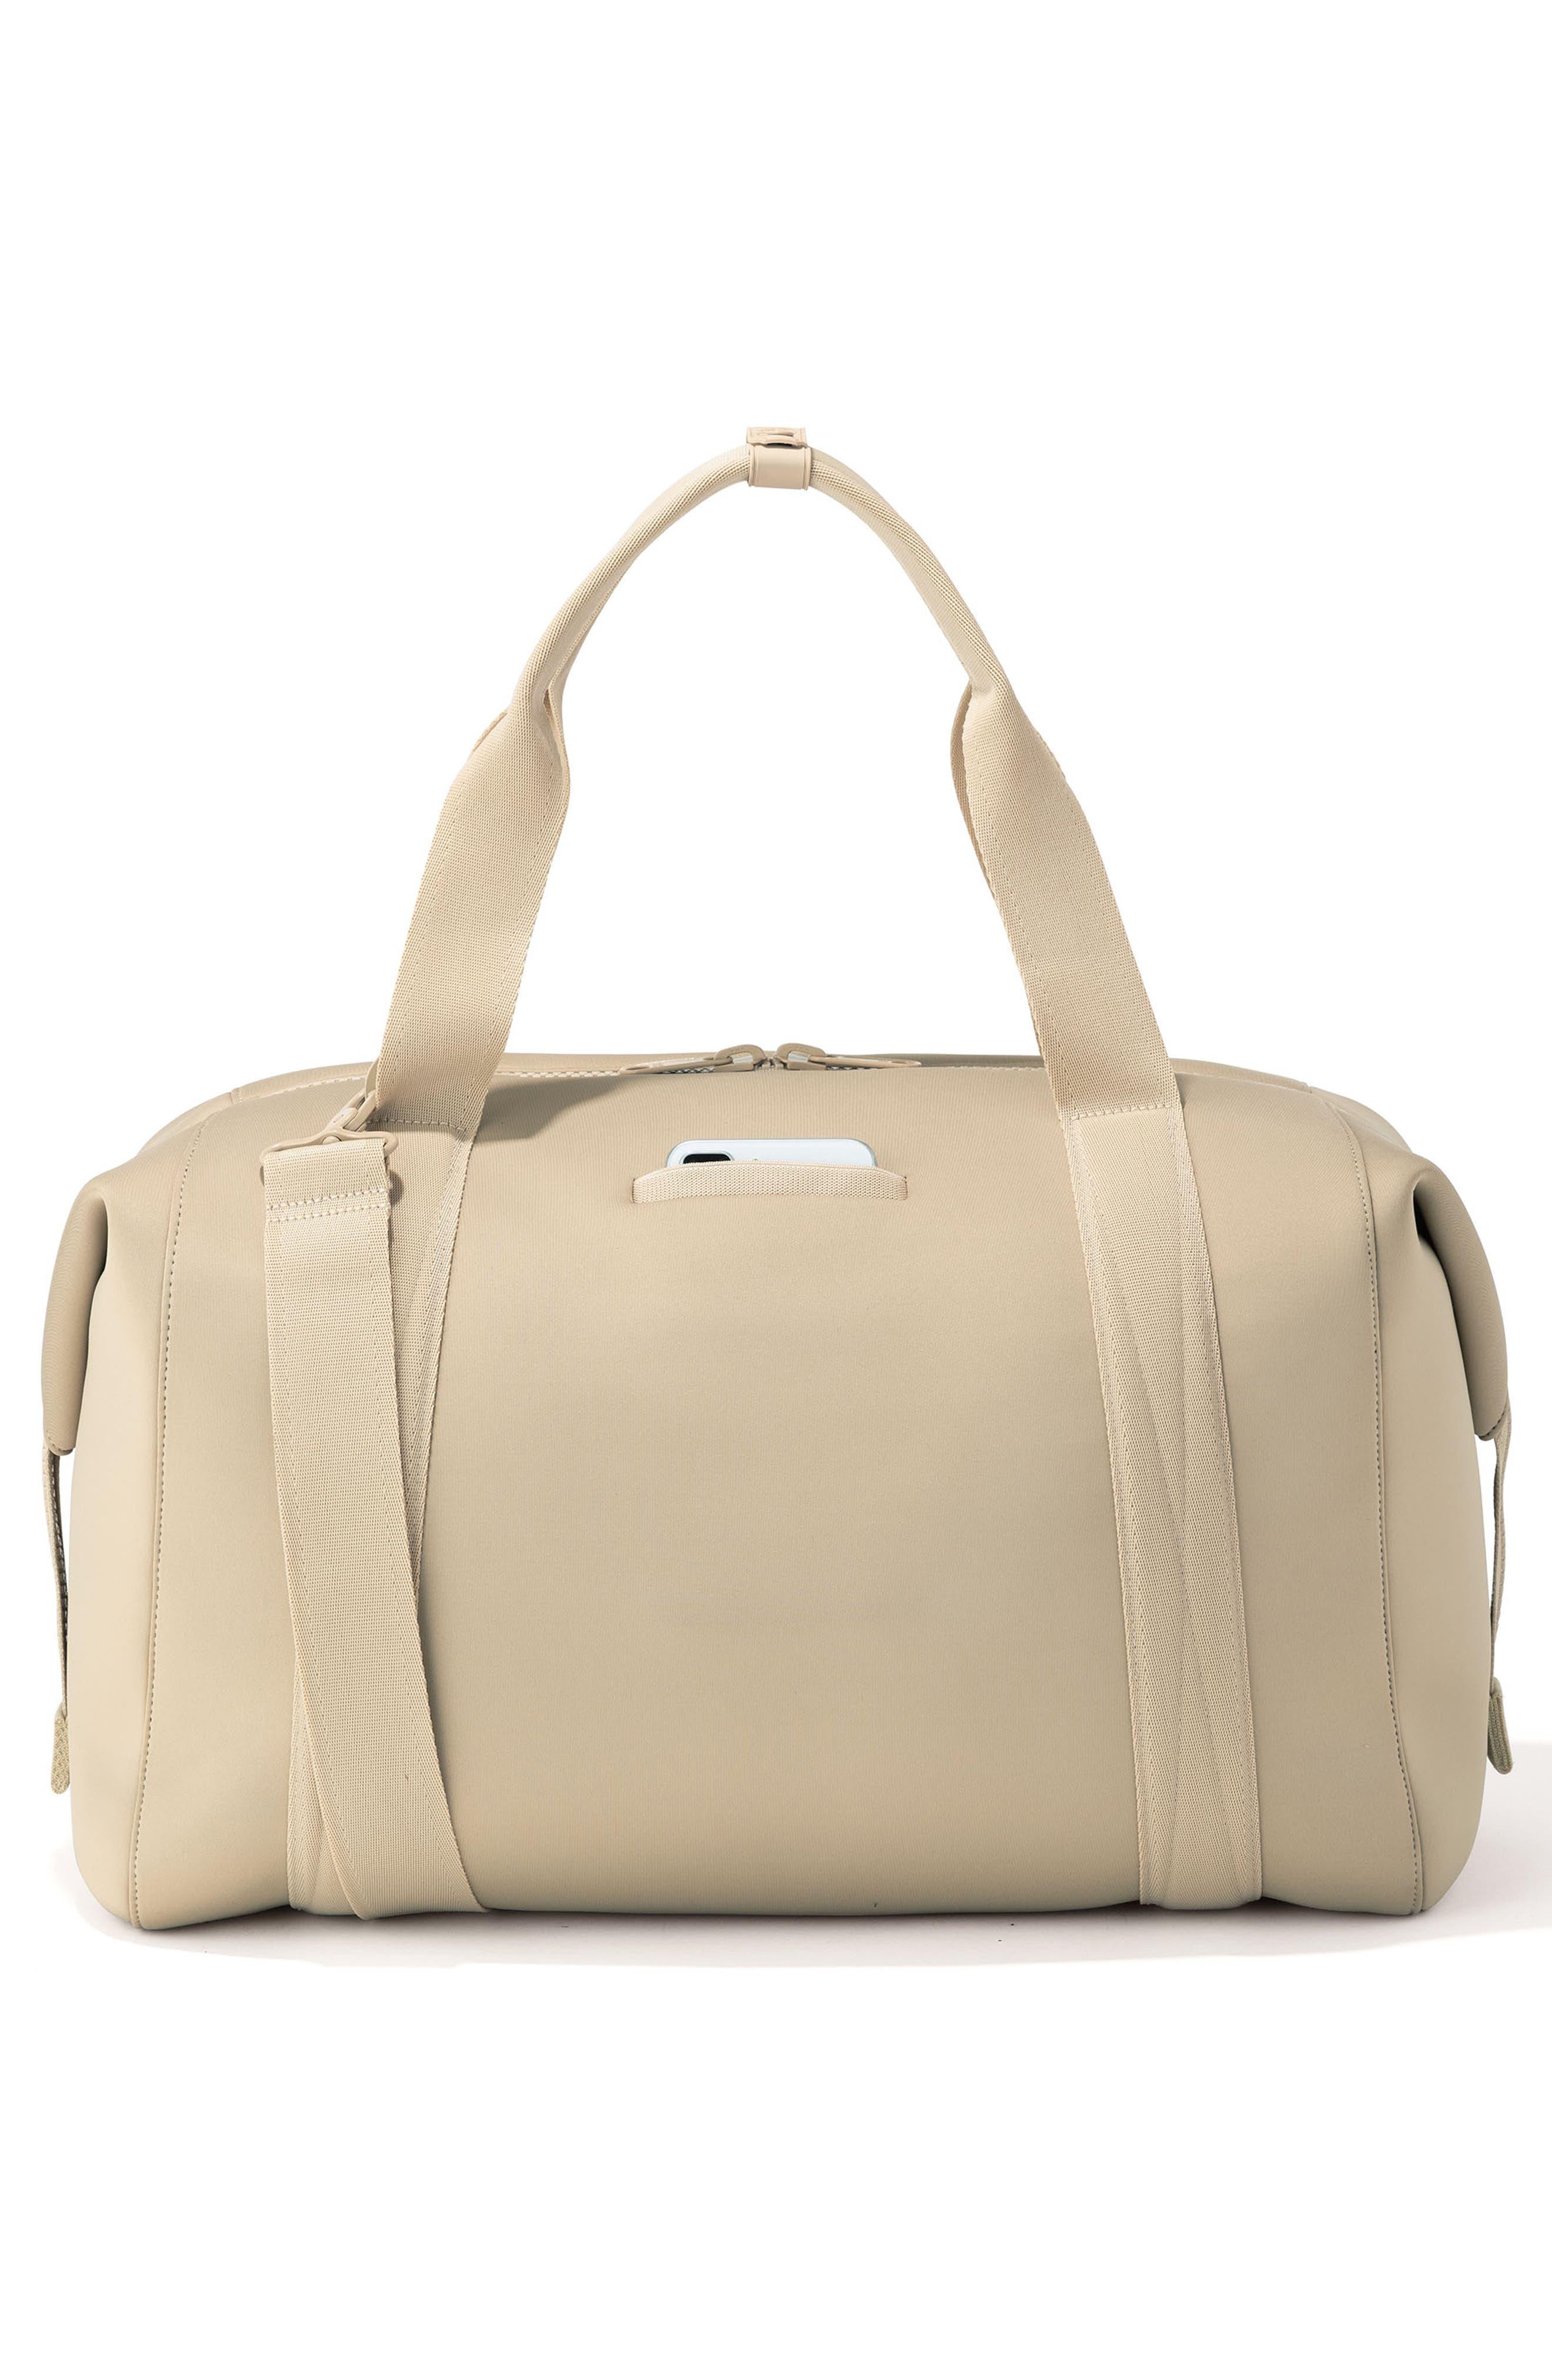 DAGNE DOVER, XL Landon Carryall Duffle Bag, Alternate thumbnail 2, color, ALMOND LATTE